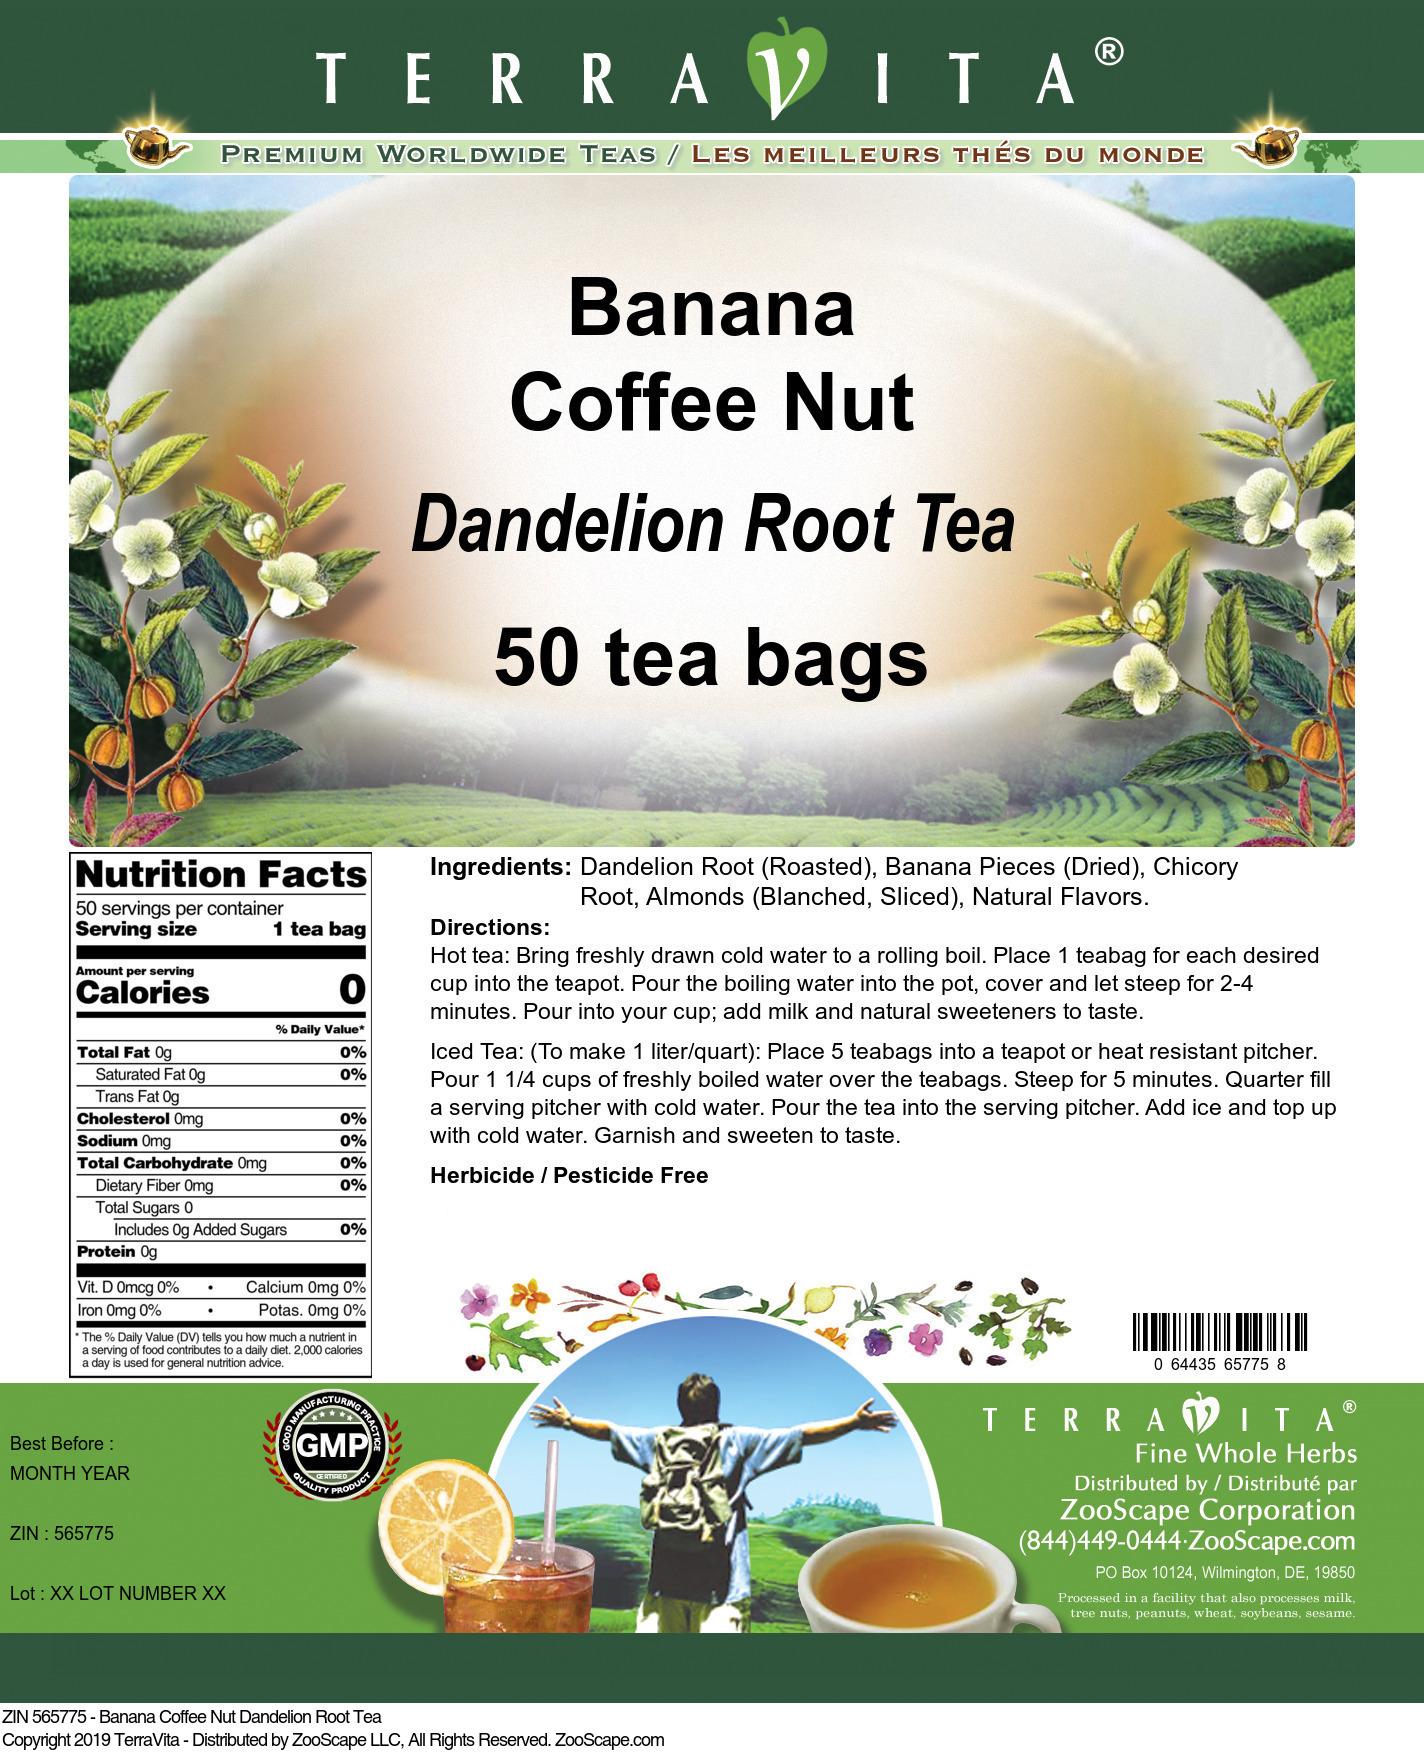 Banana Coffee Nut Dandelion Root Tea